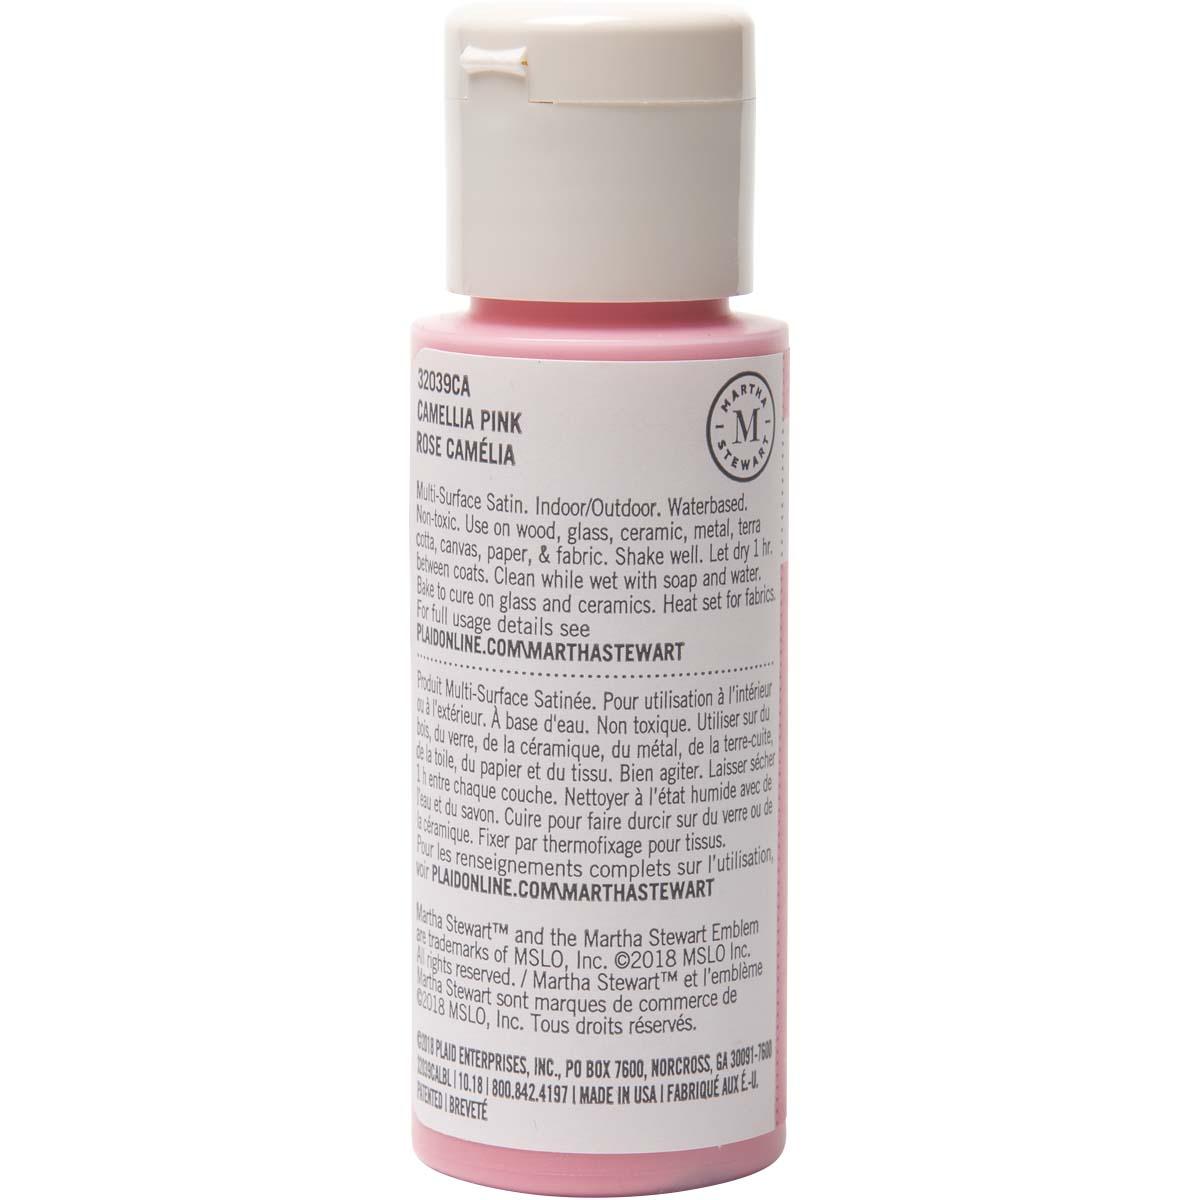 Martha Stewart ® Multi-Surface Satin Acrylic Craft Paint - Camellia Pink, 2 oz. - 32039CA